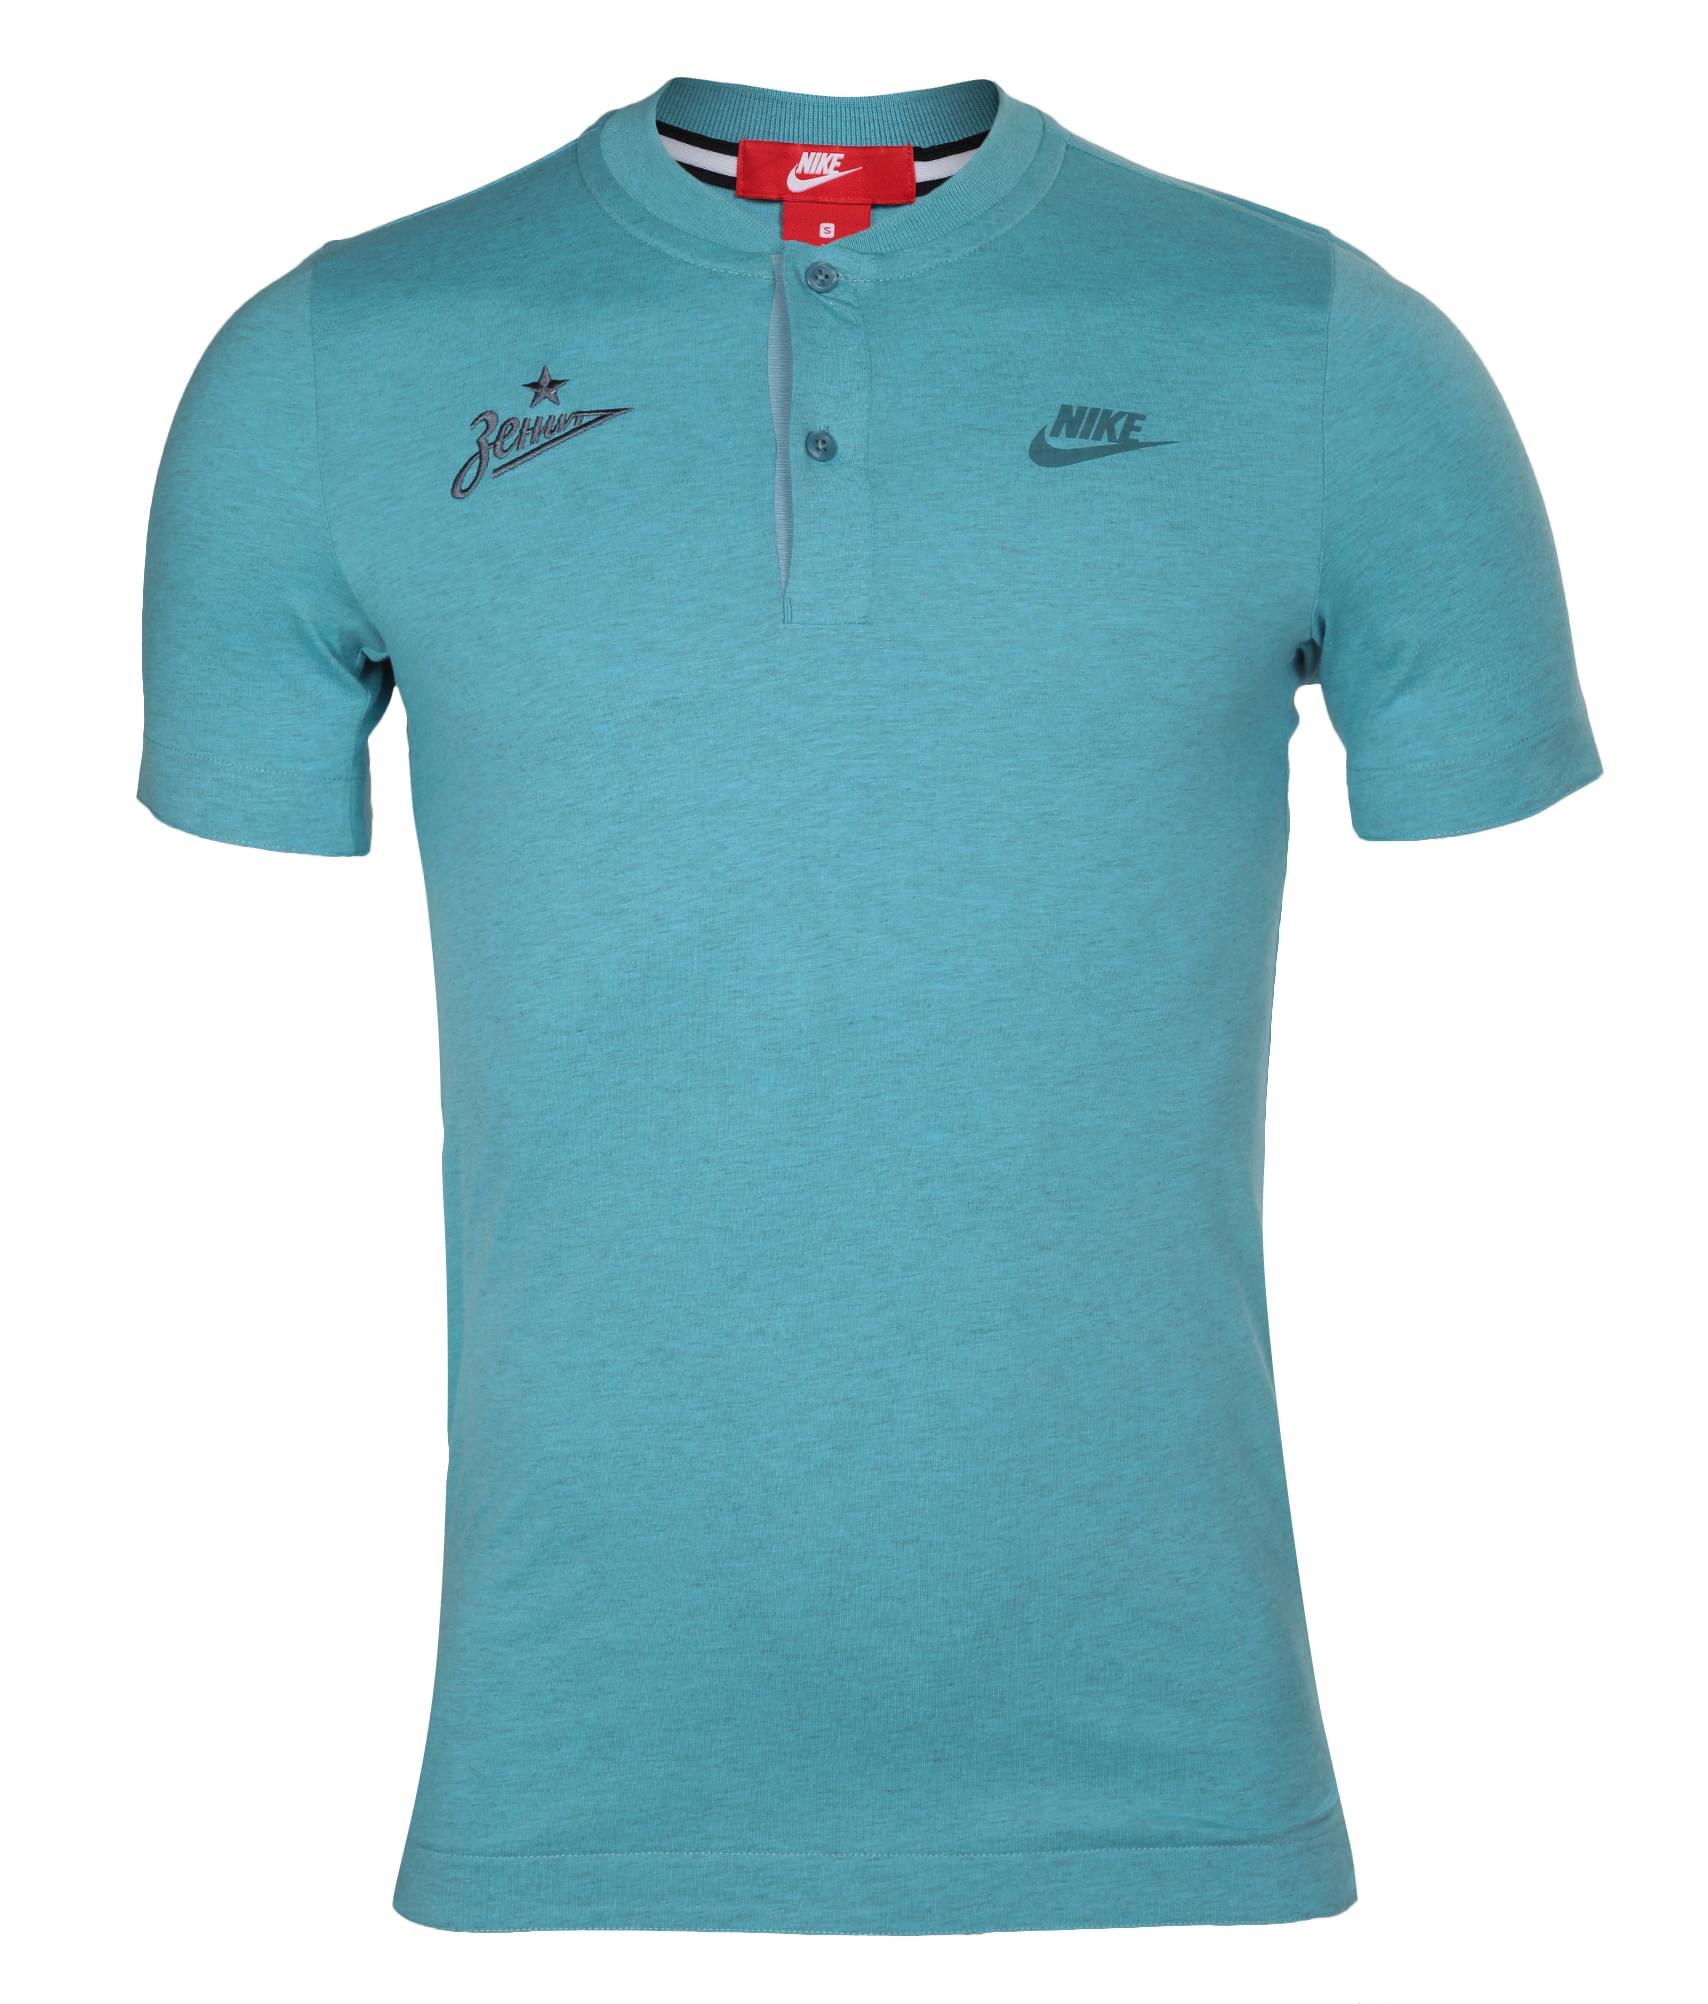 Поло Nike, Цвет-Голубой, Размер-XL поло nike цвет голубой размер m